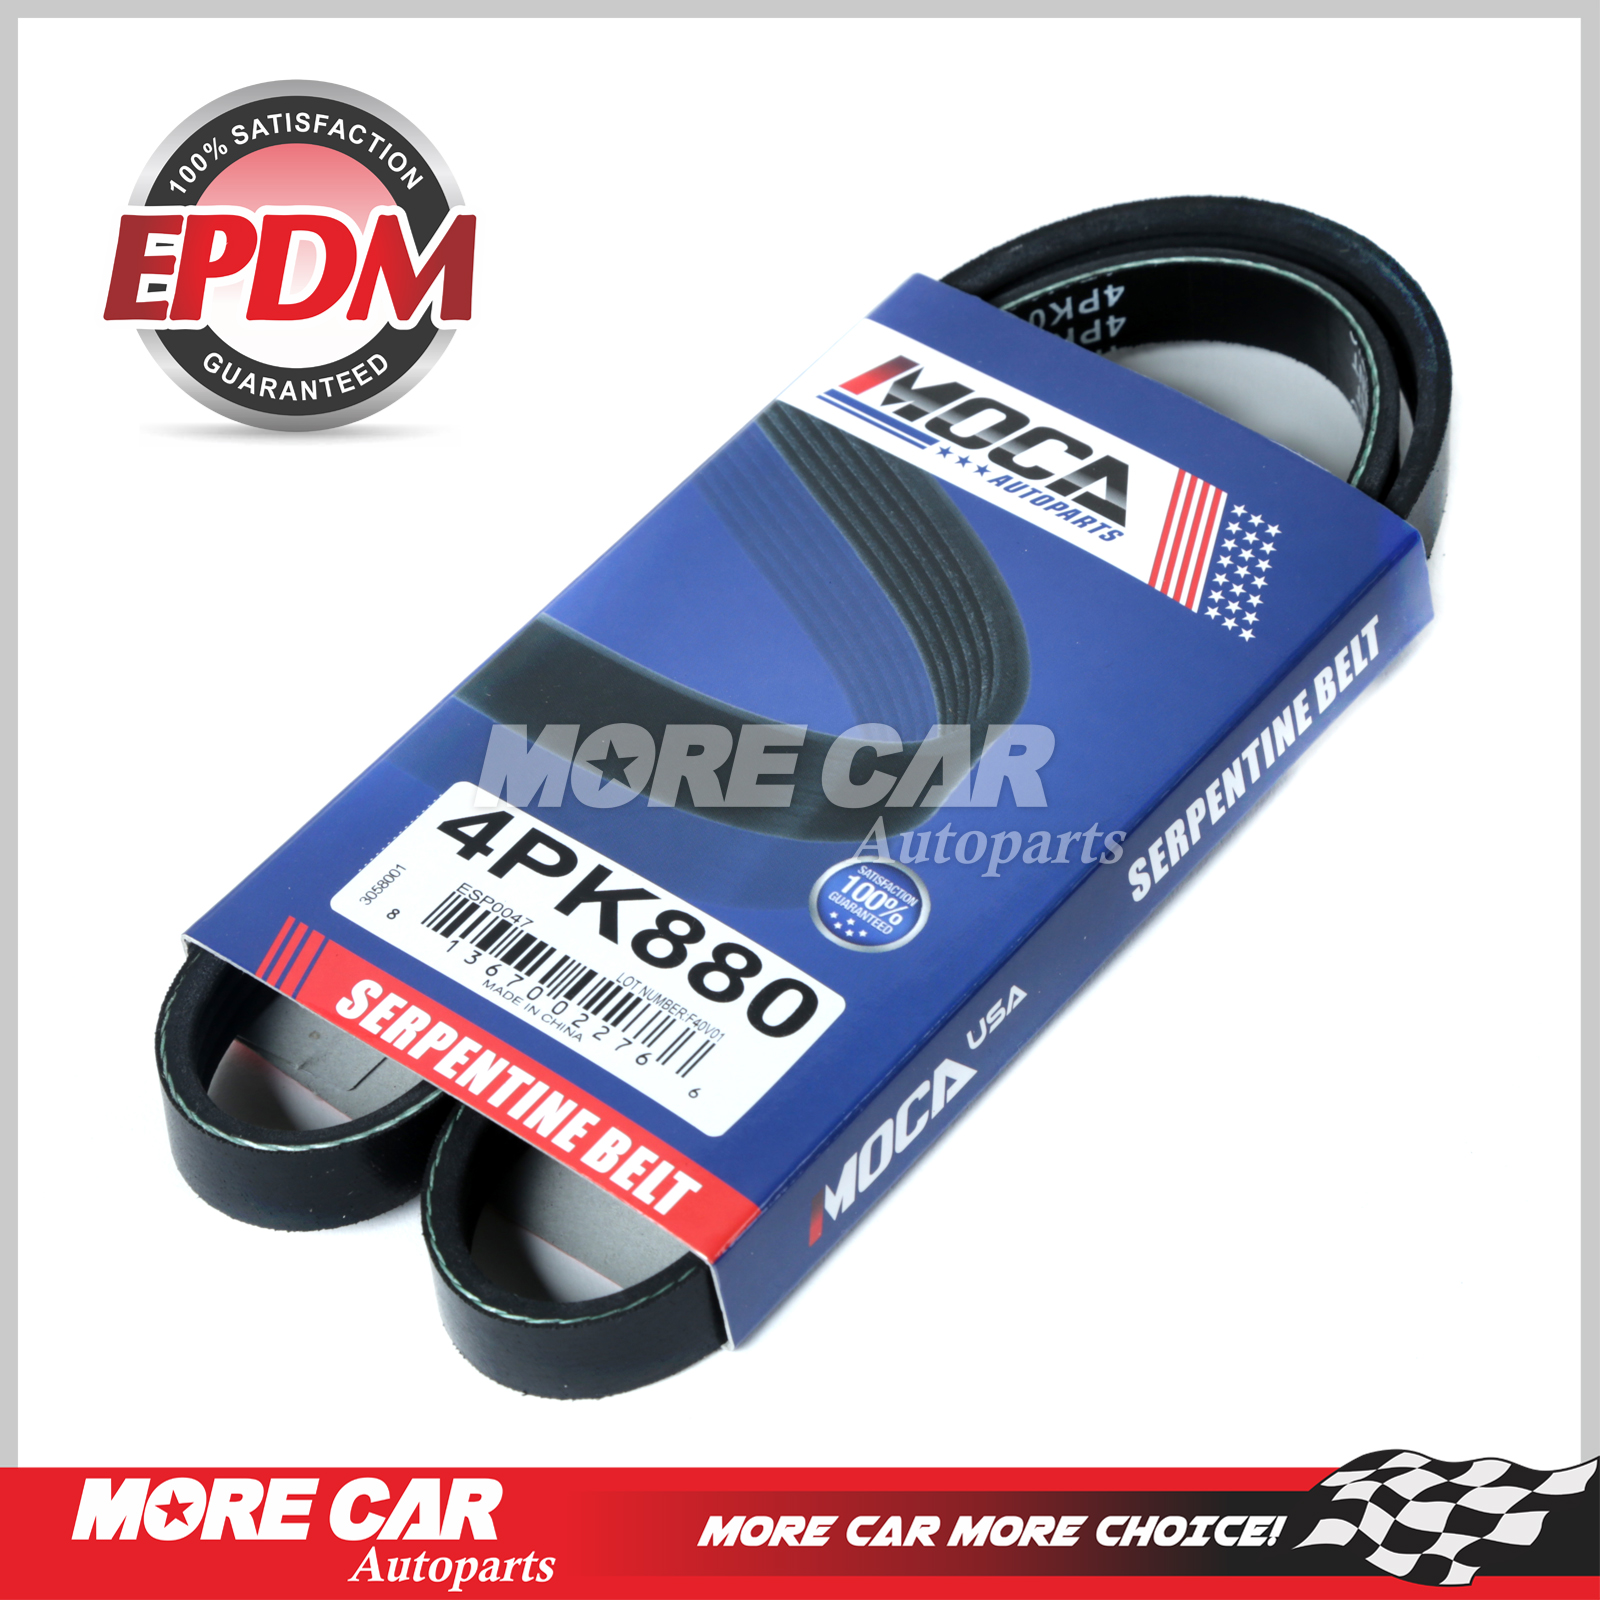 EPDM Fits 02-03 Toyota Camry 4-Door 3.0L V6 GAS DOHC